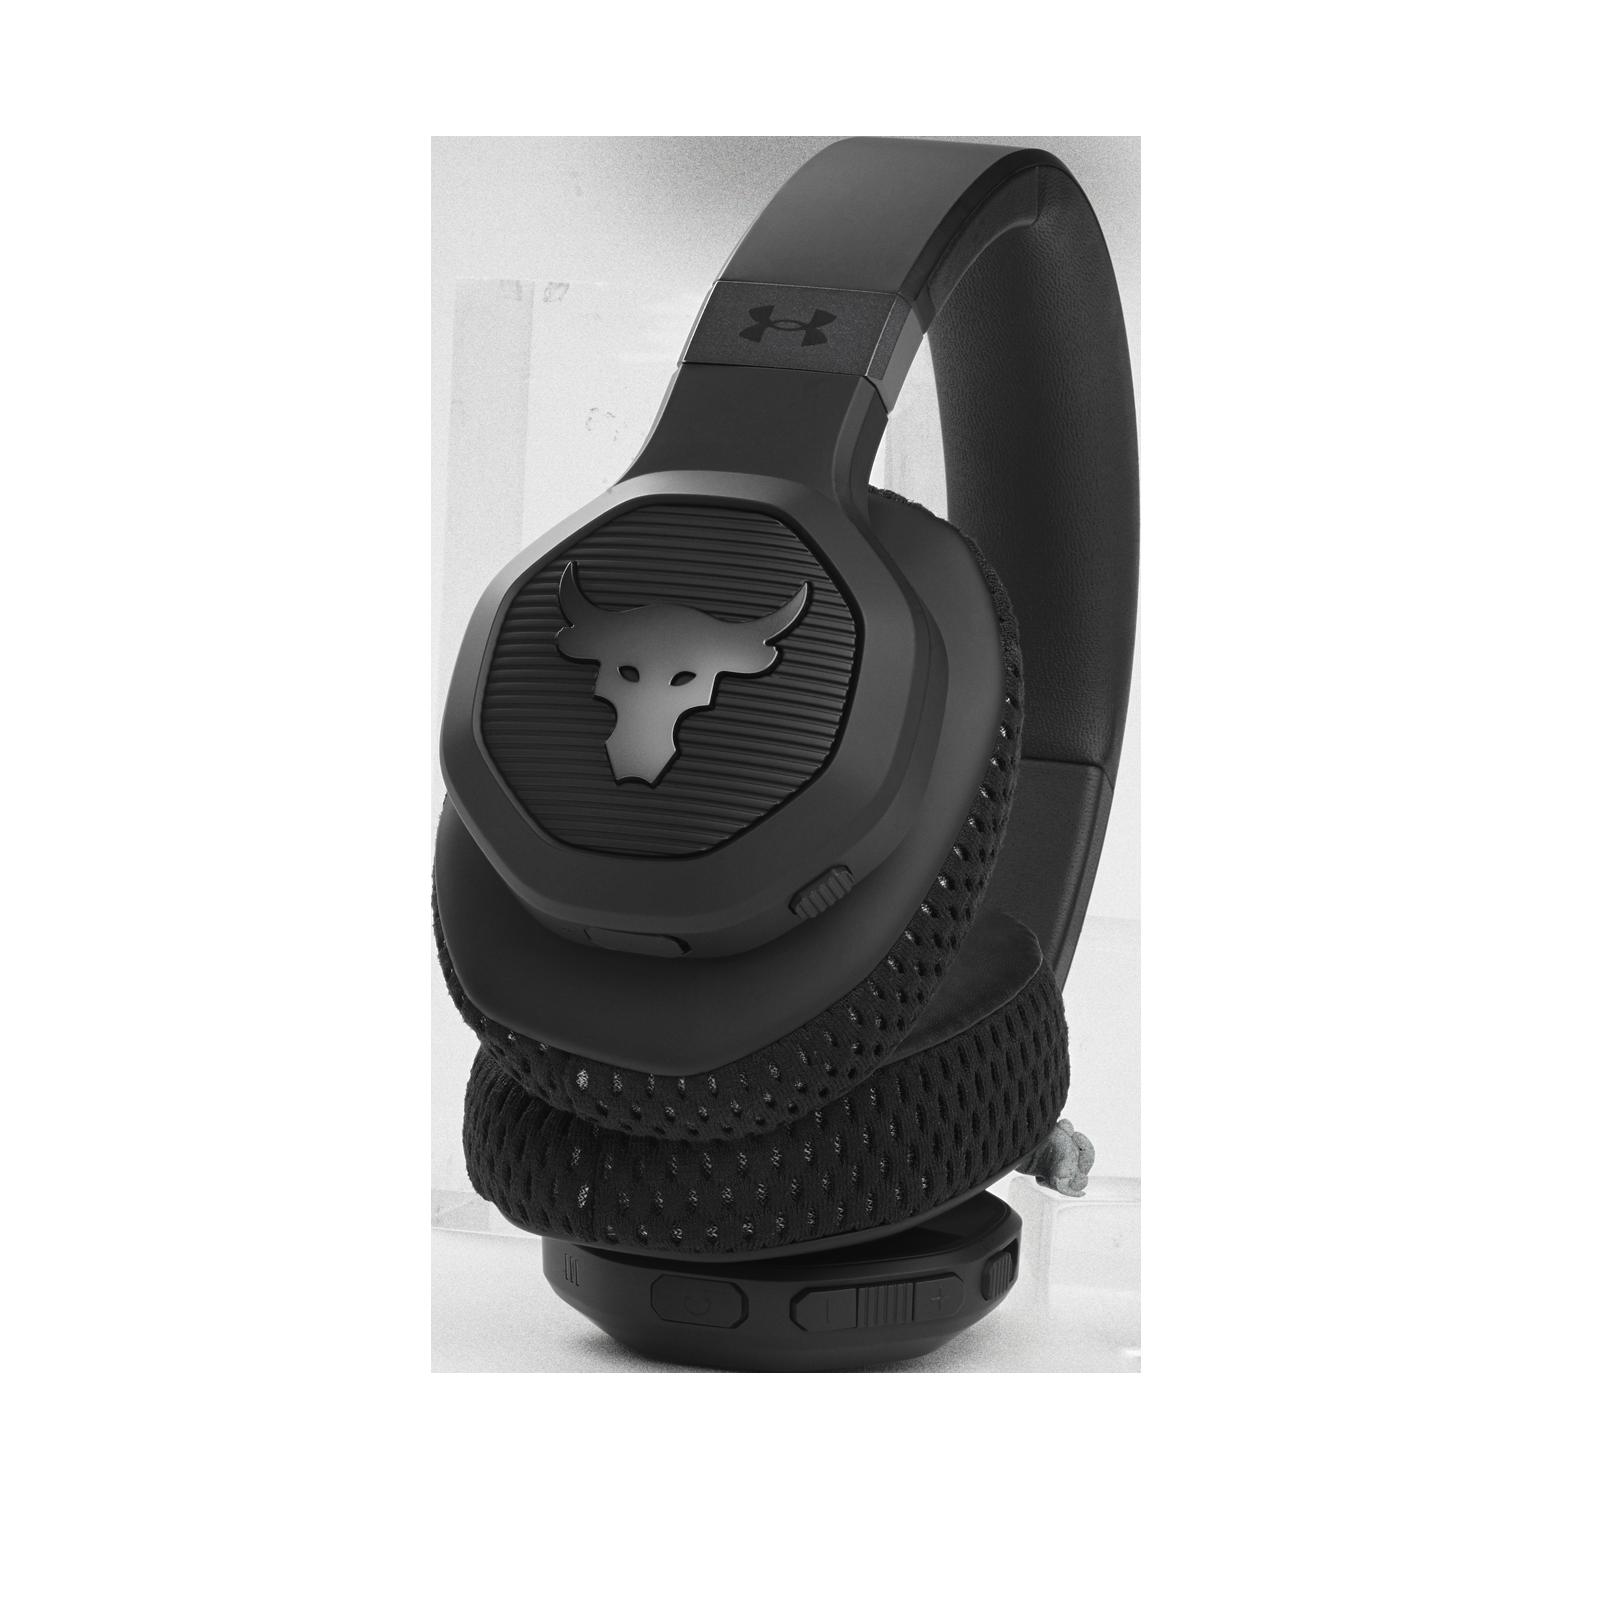 UA Project Rock Over-Ear Training Headphones - Engineered by JBL - Black - Over-Ear ANC Sport Headphones - Detailshot 1